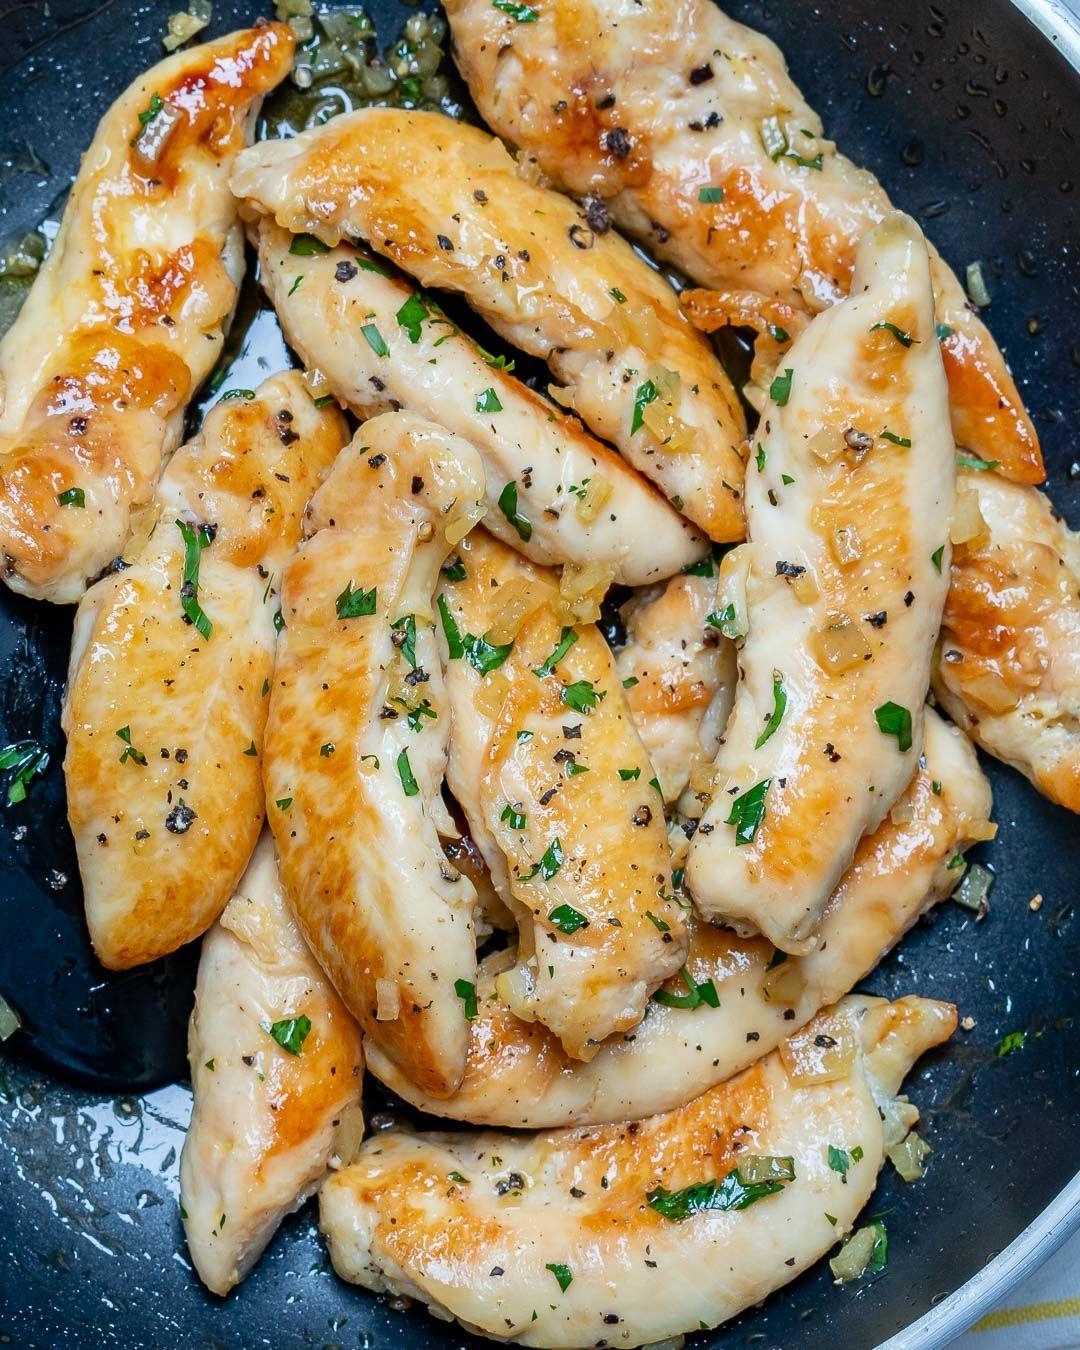 Honey Garlic Butter Chicken Tenders for Clean Eating Meal Prep  Honey Garlic Butter Chicken Tenders for Clean Eating Meal Prep